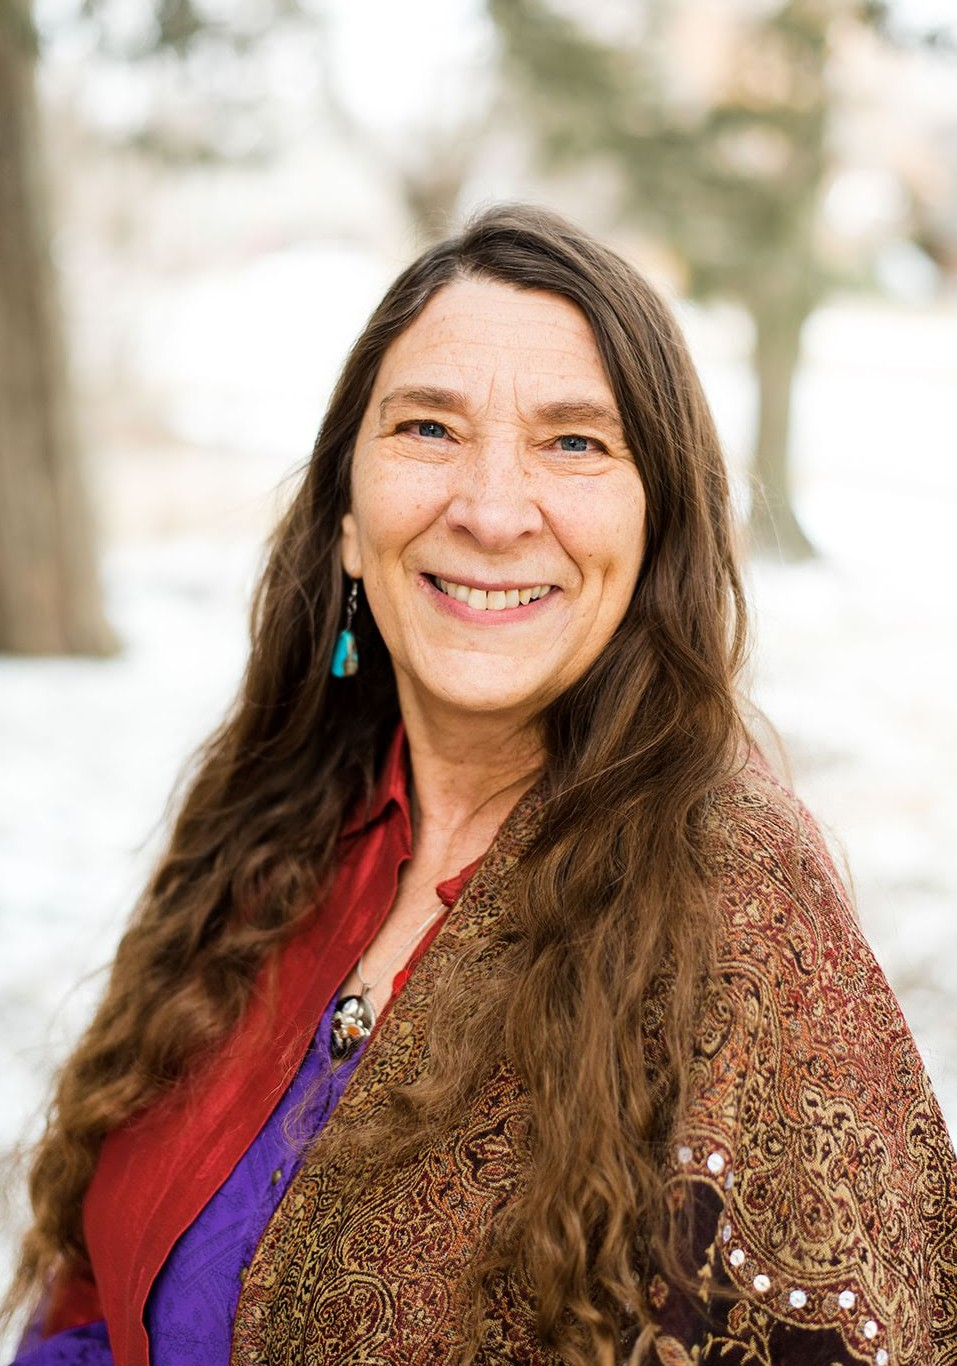 Sharon Burch MSN, APRN, PHCNS-BC, APHN-BC, HWNC-BC